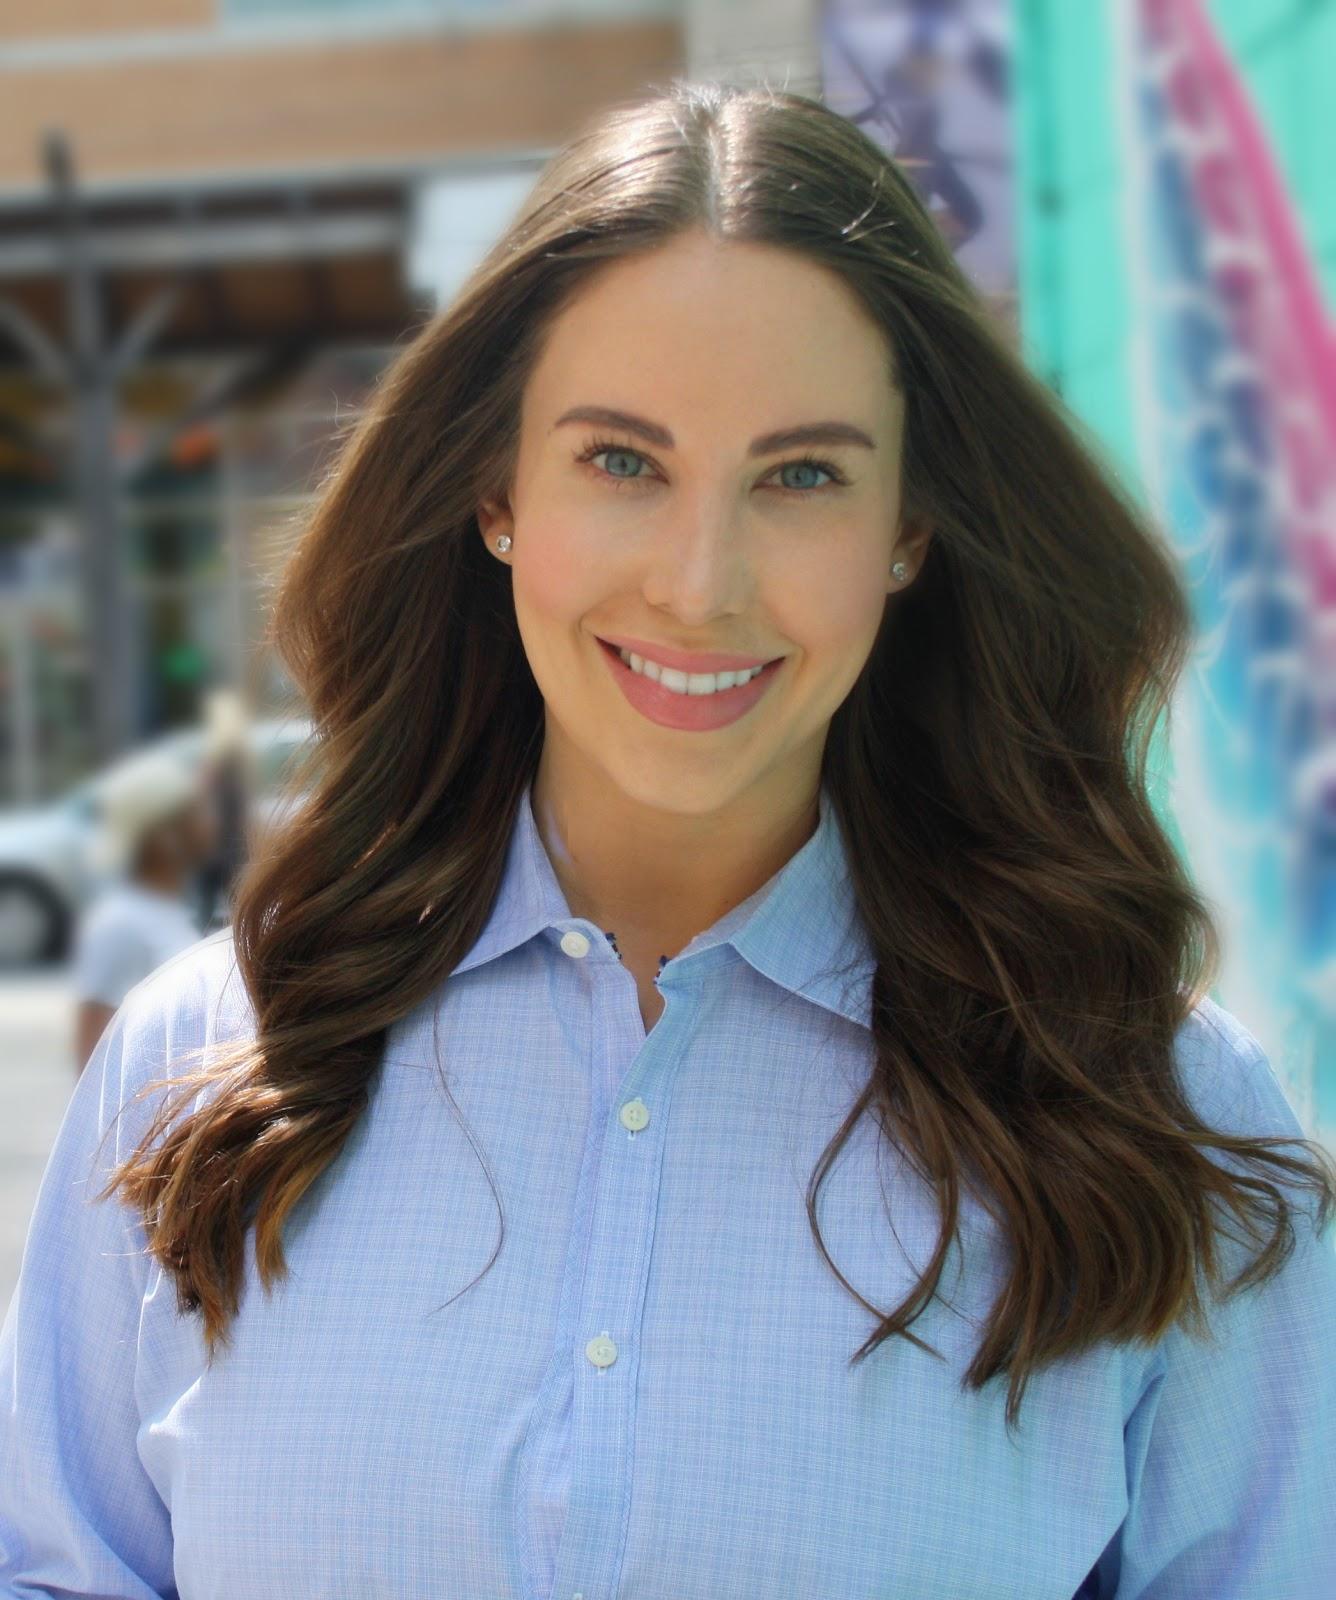 A headshot of Dr. Sarah Saska, CEO of Feminuity.